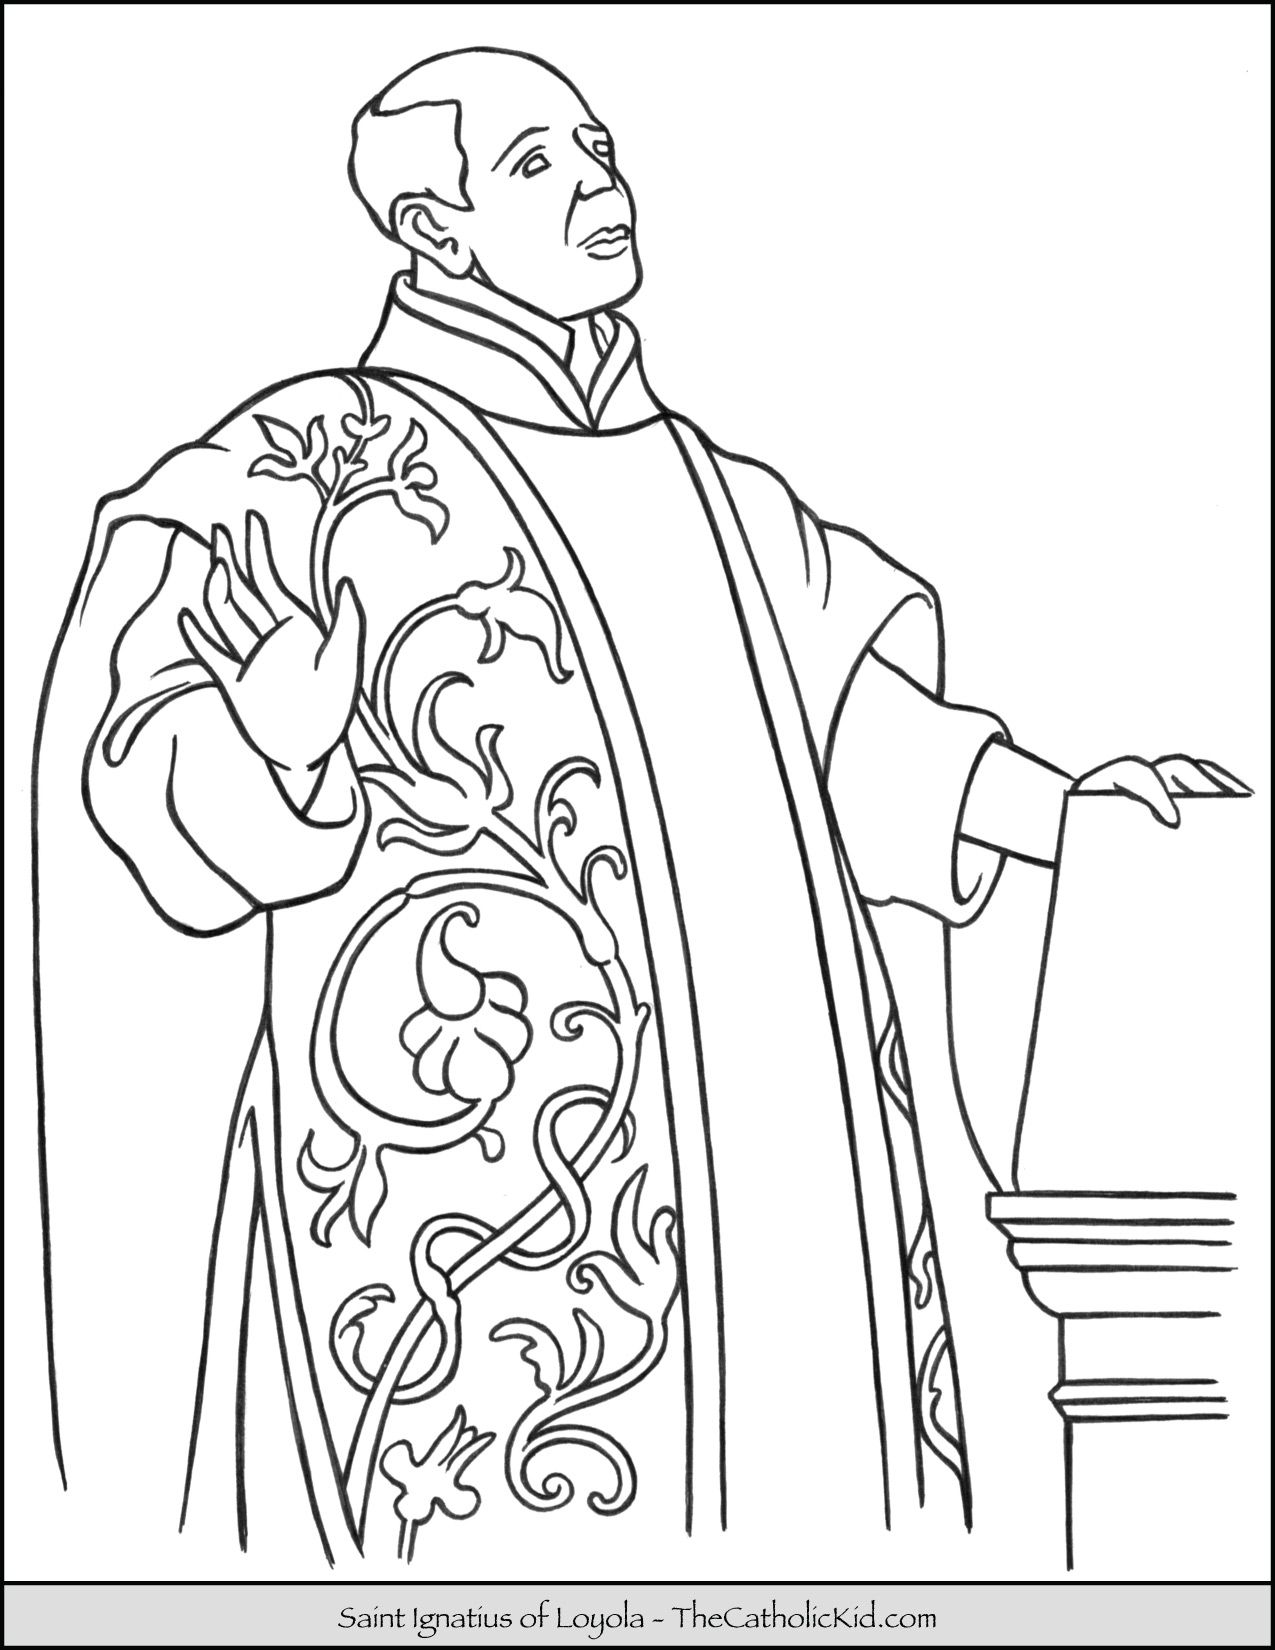 Saint Ignatius Of Loyola Coloring Page Thecatholickid Com